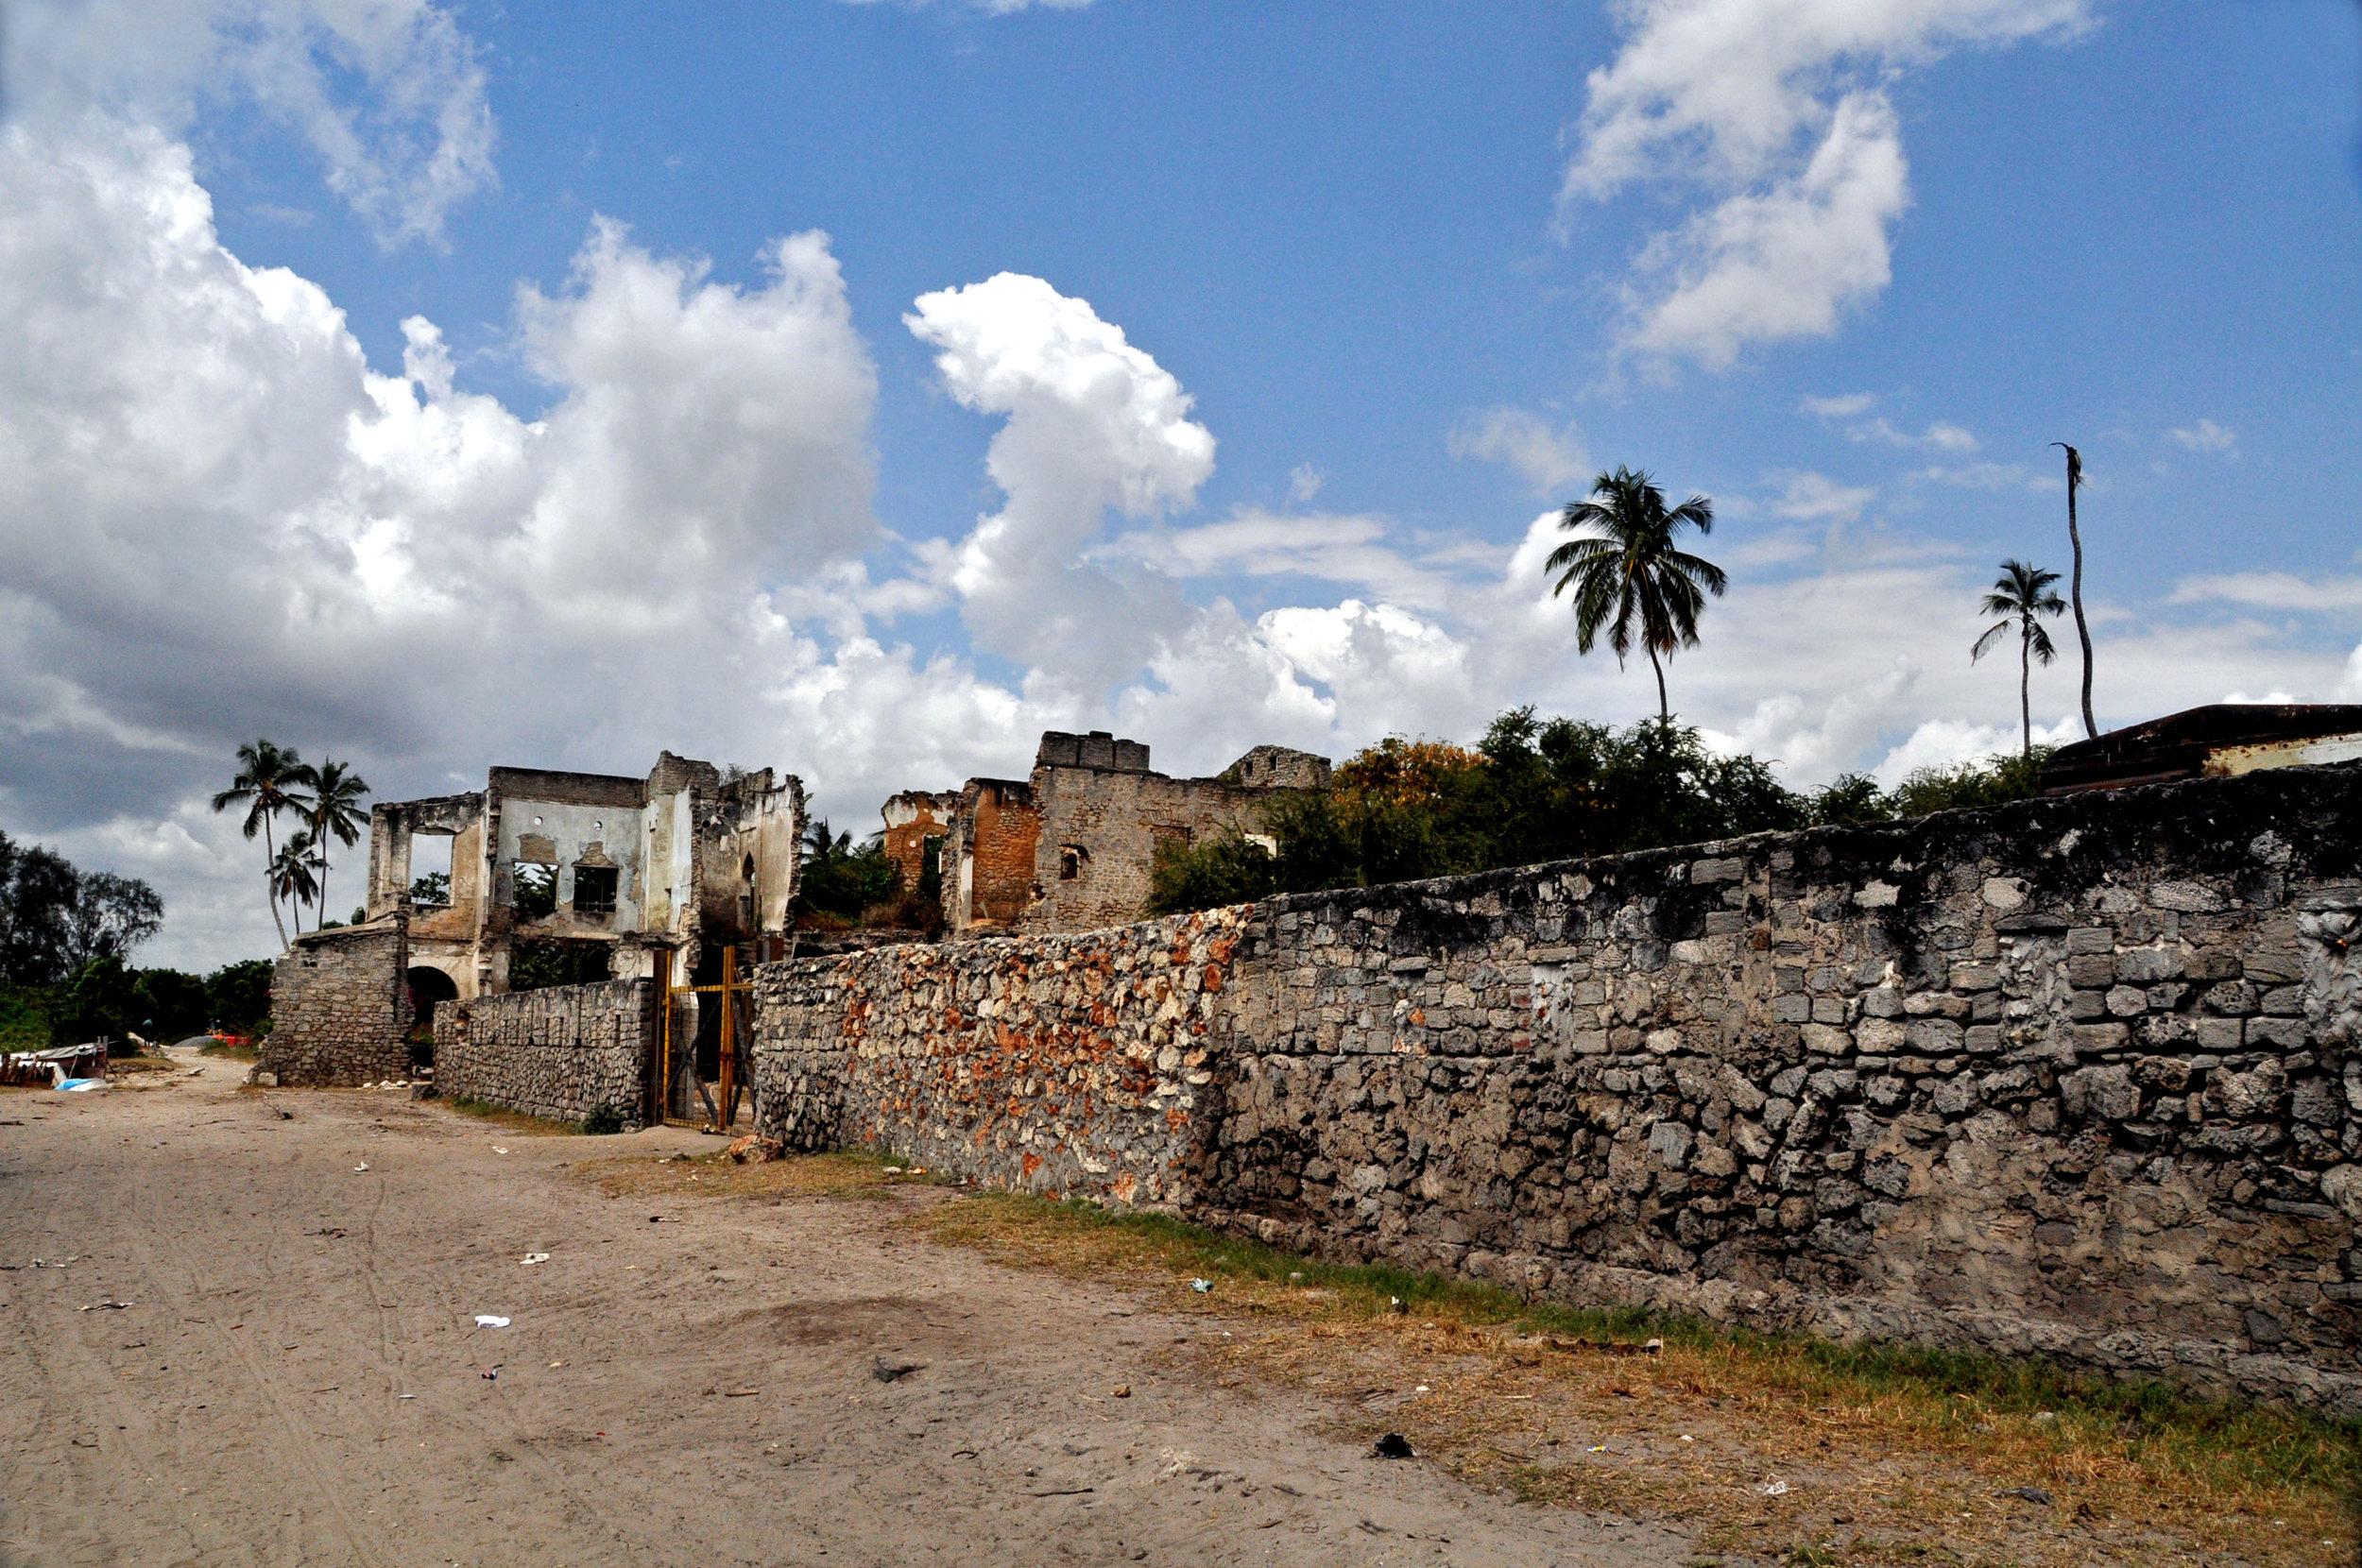 Bagamoyo c. 21st century